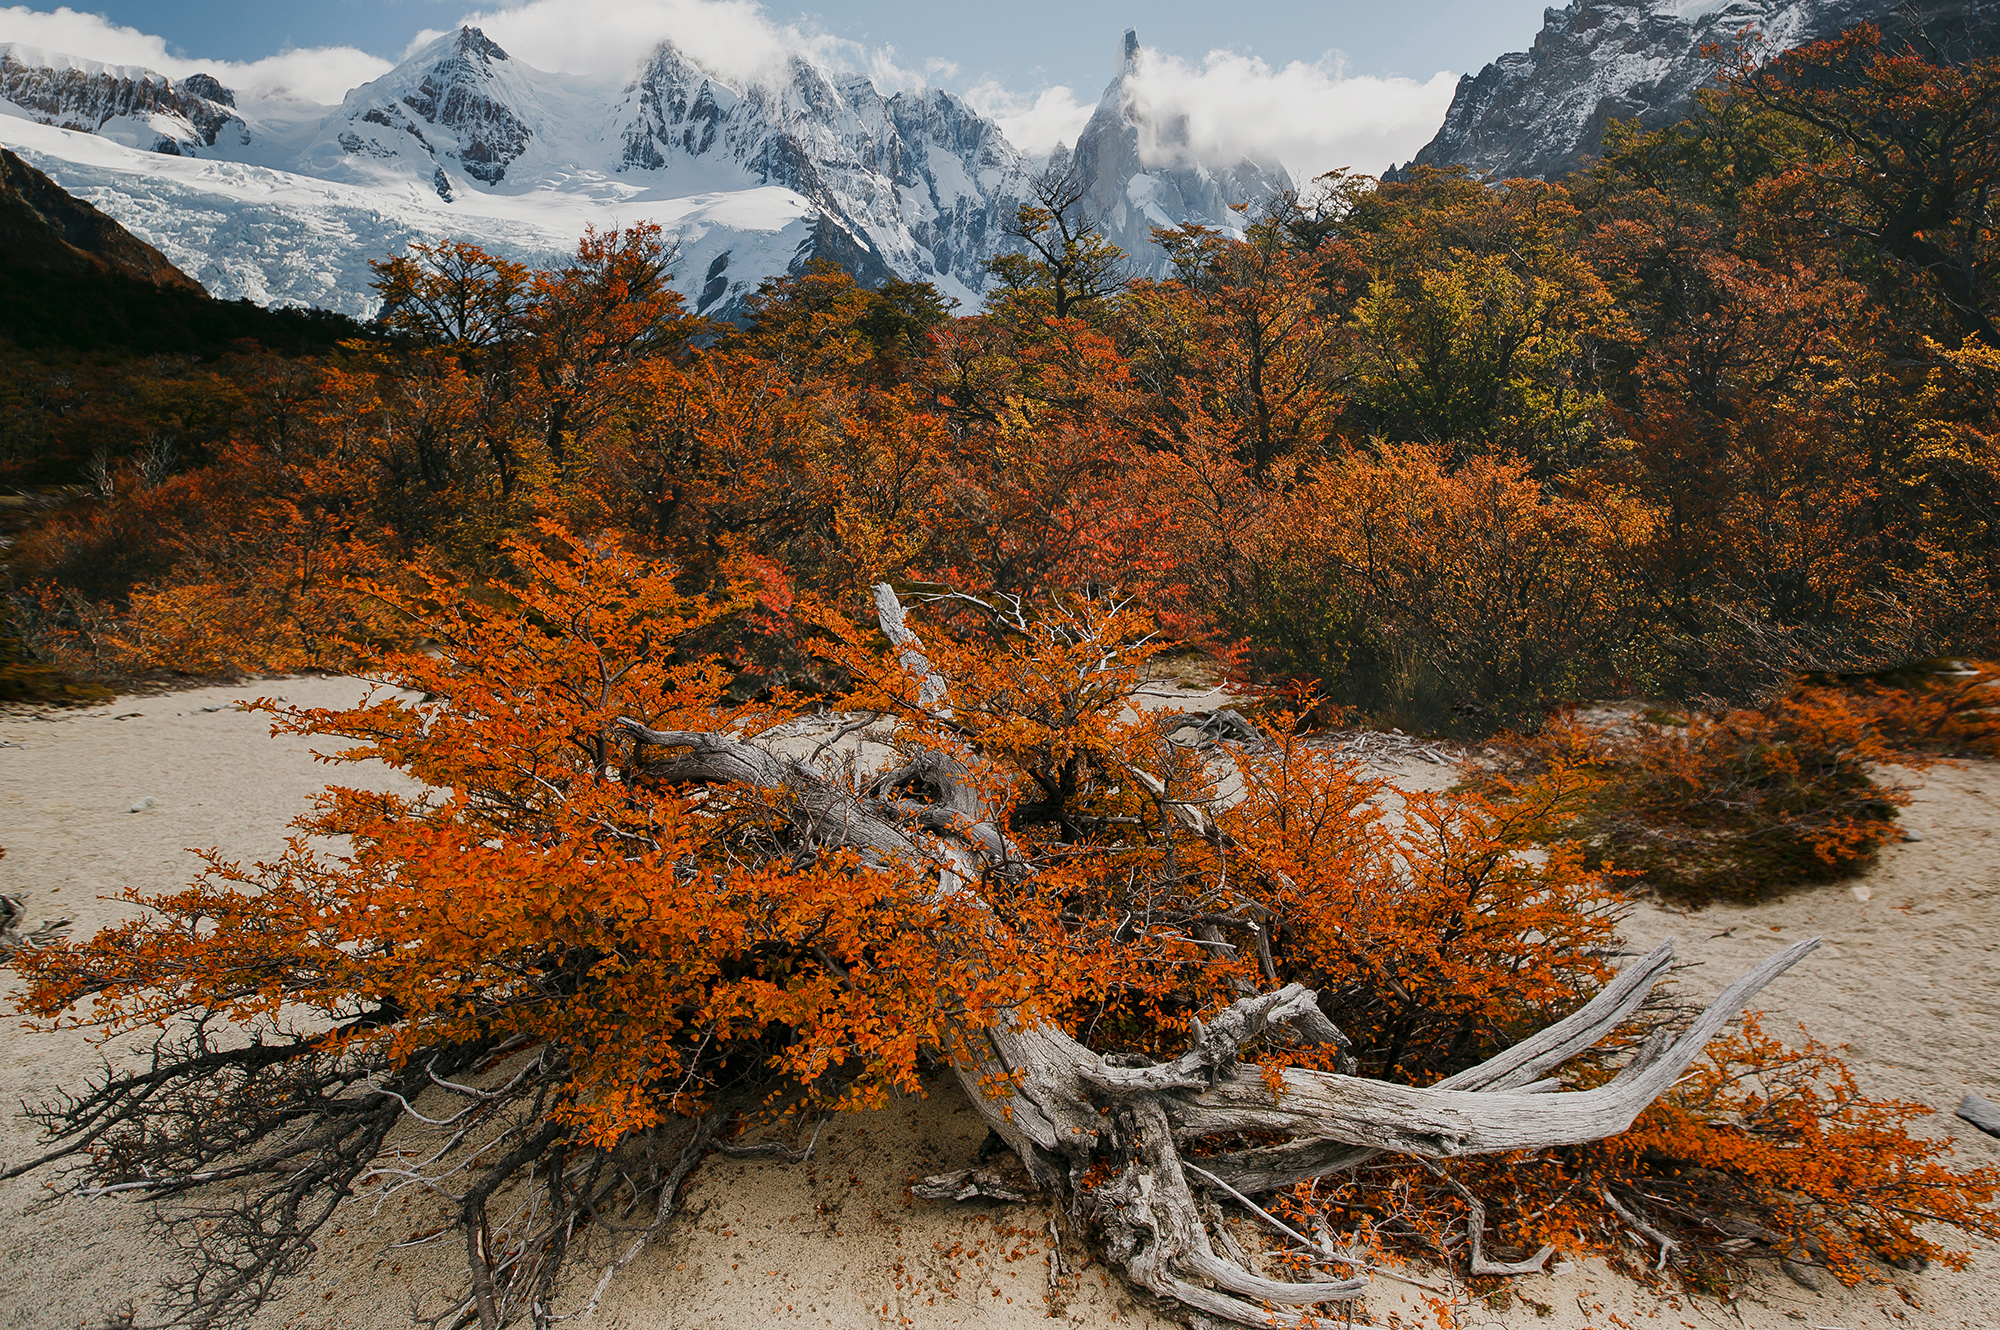 2I7B102520-patagonie-chili-sophie-narses-photographe-paysage-monde-annecy-tirages